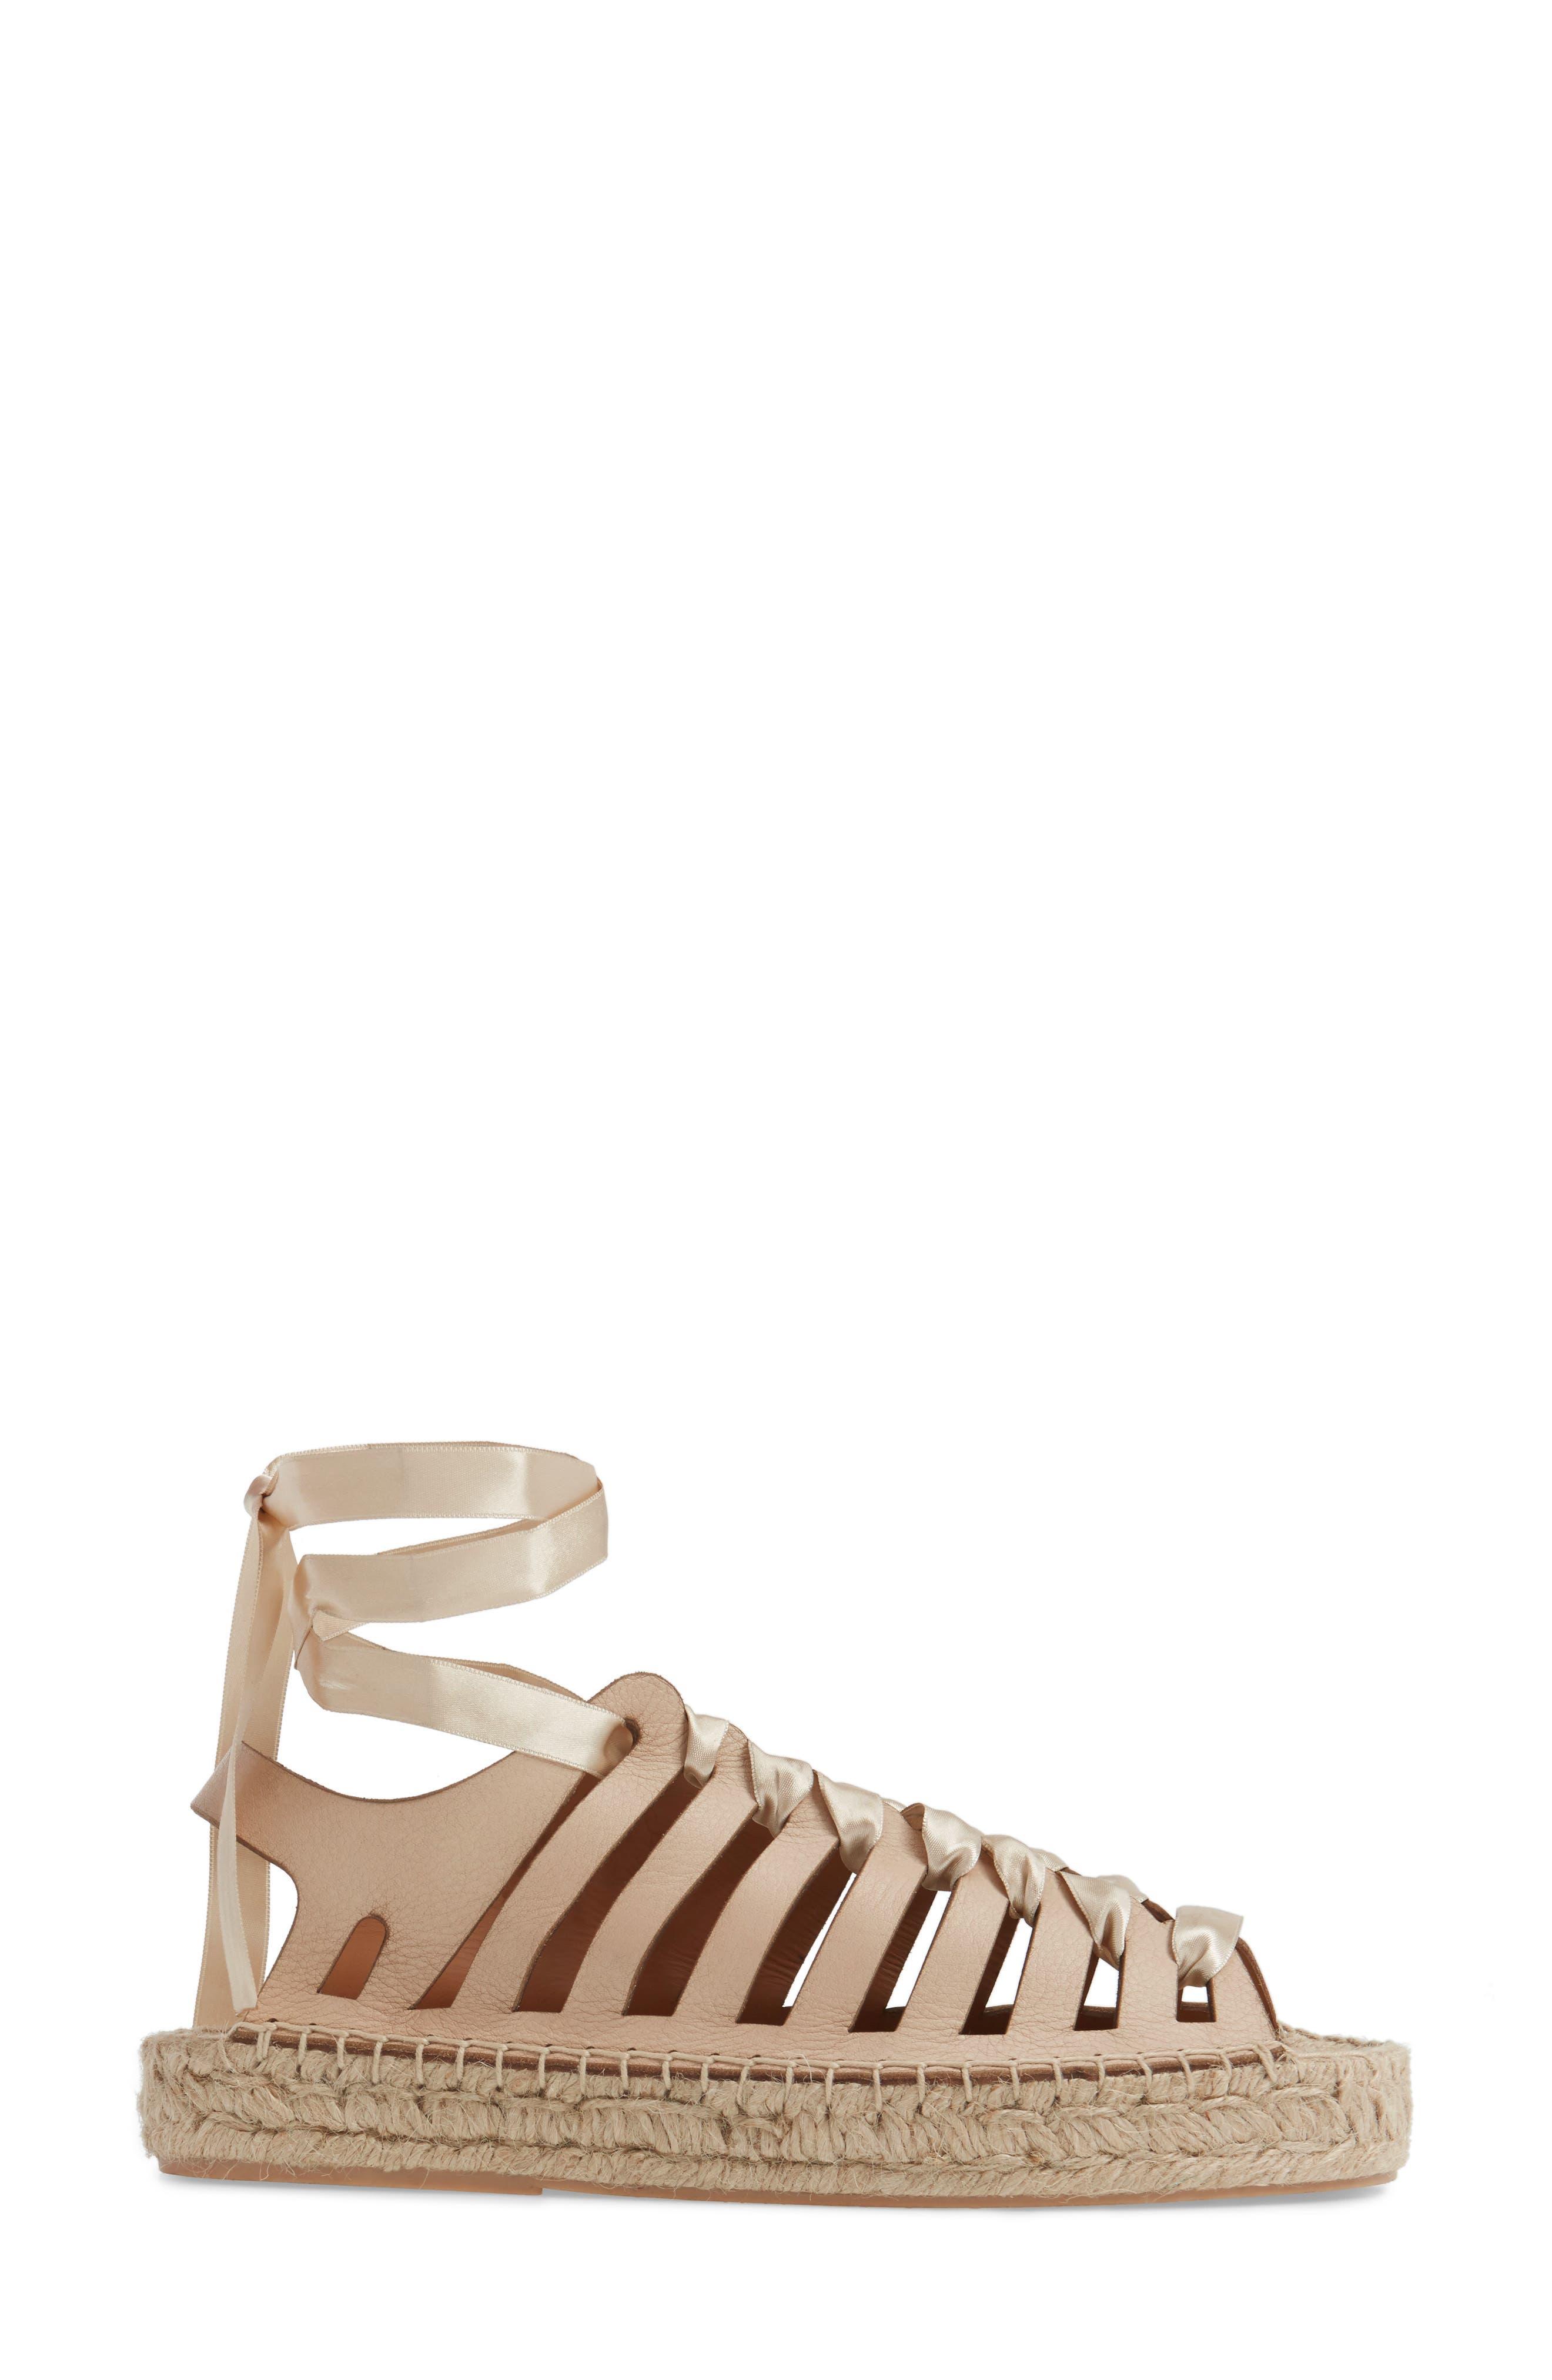 Krown Wraparound Platform Sandal,                             Alternate thumbnail 6, color,